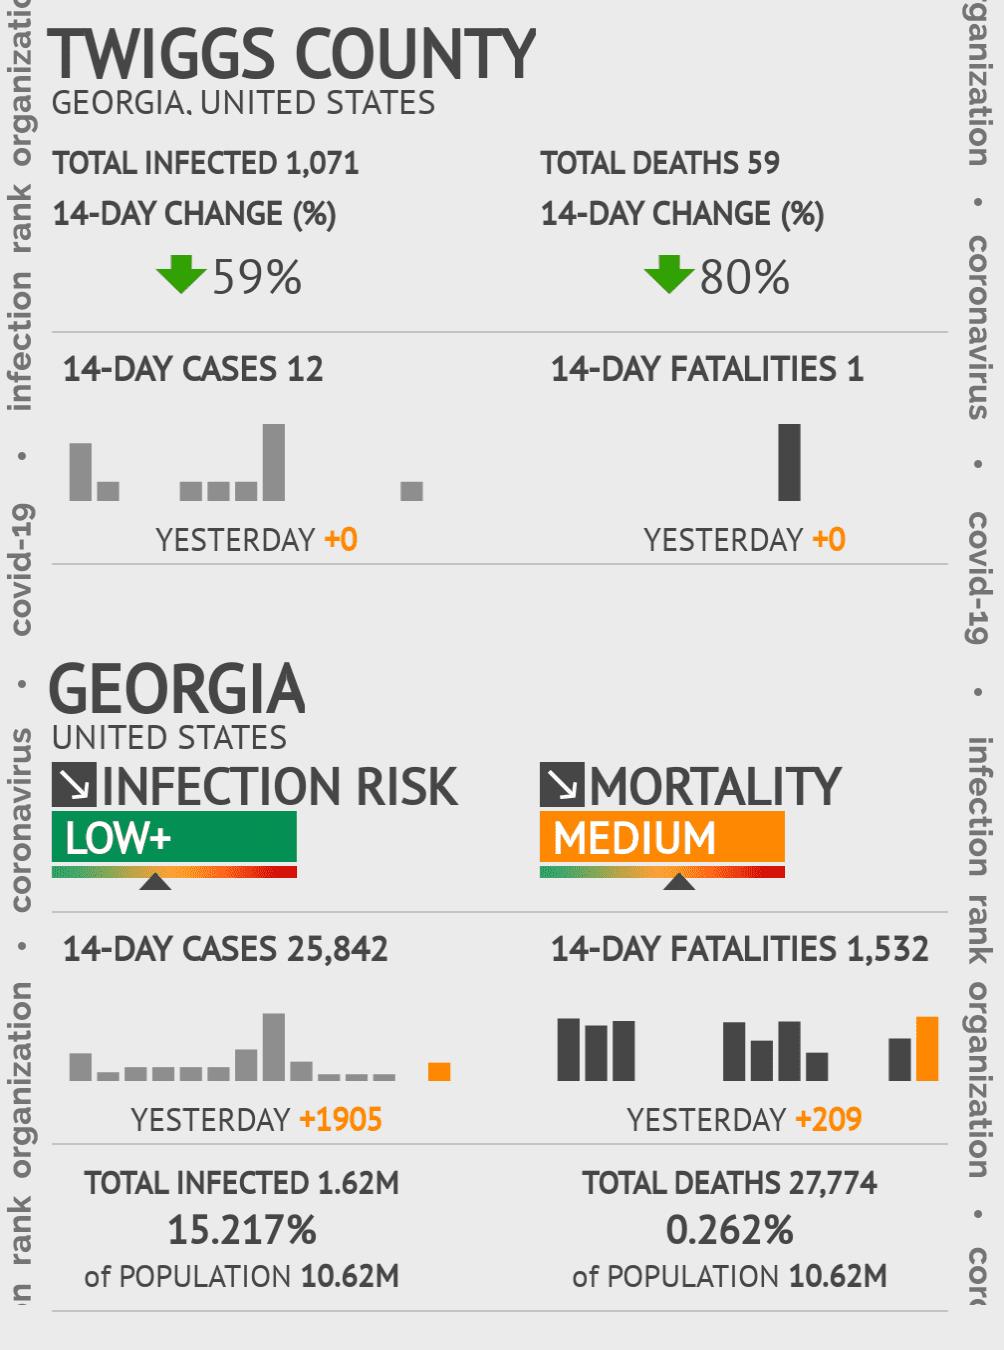 Twiggs County Coronavirus Covid-19 Risk of Infection on November 22, 2020